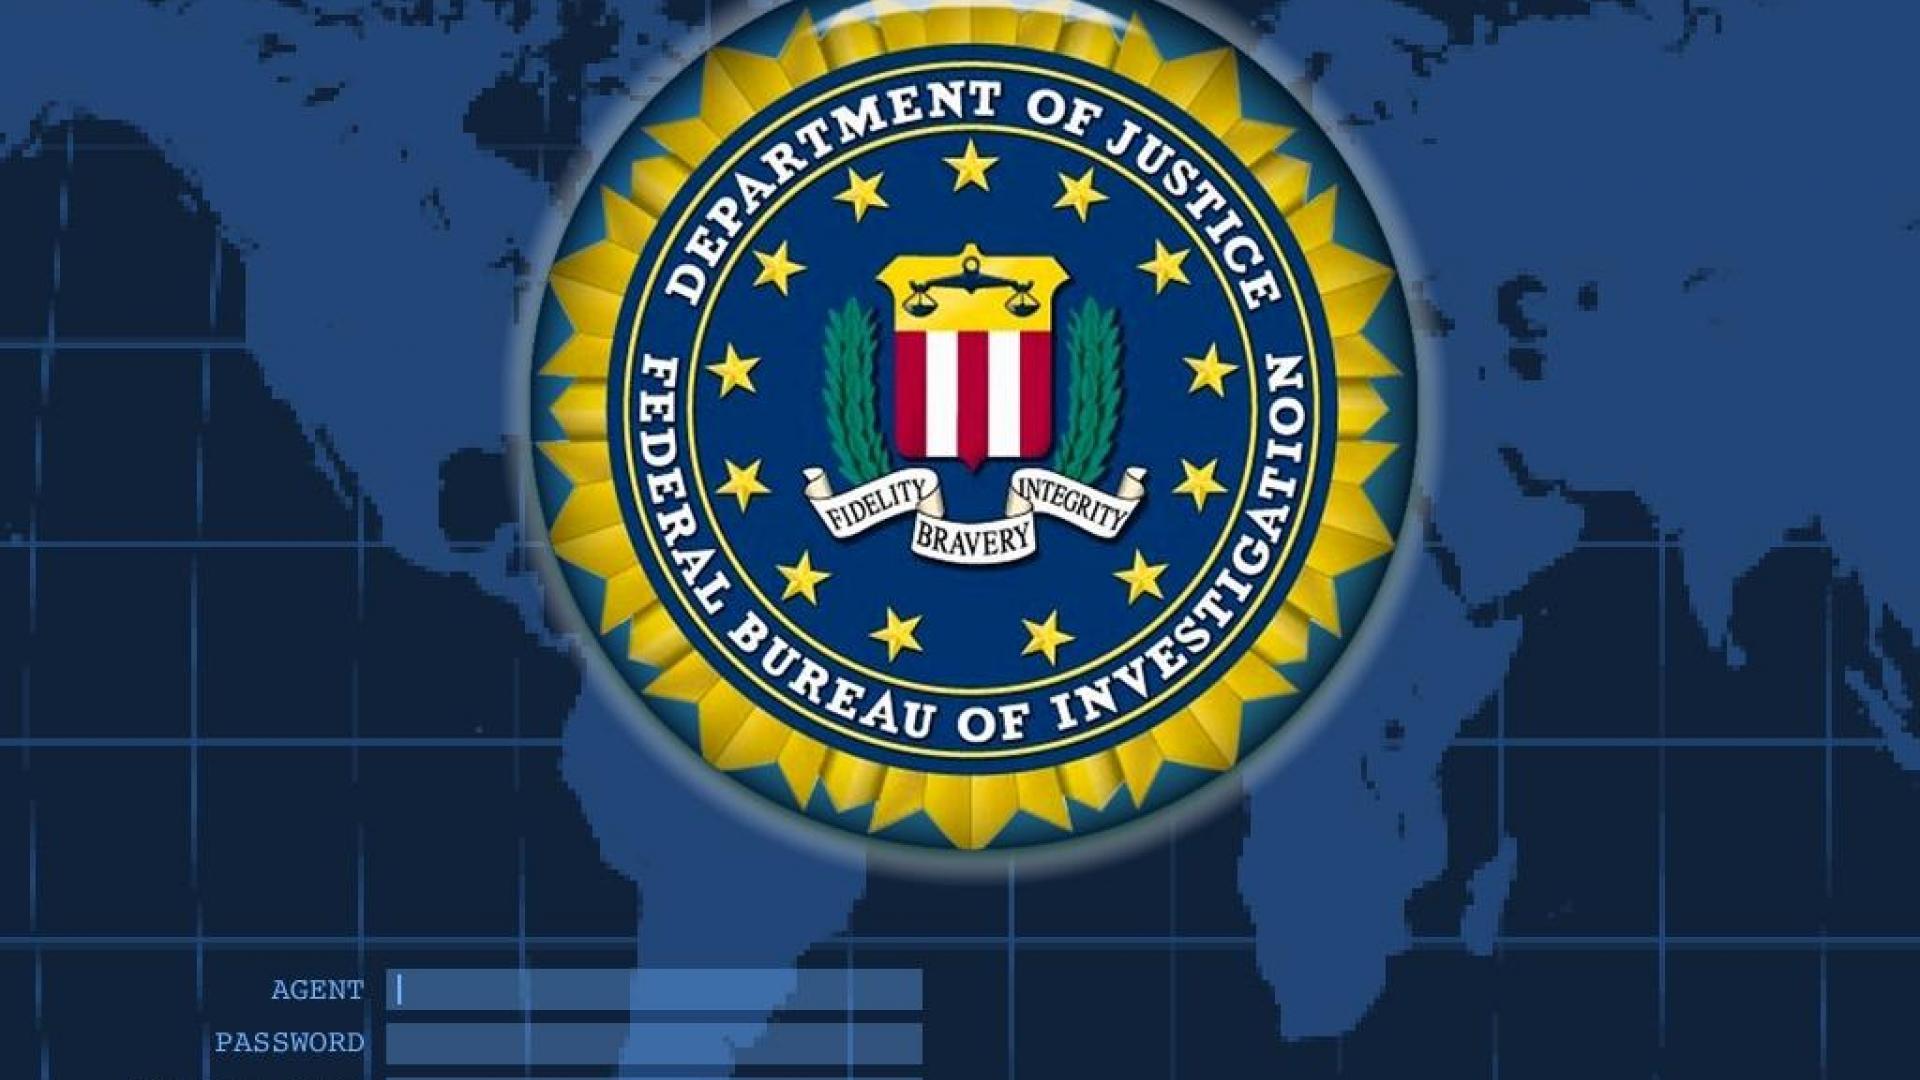 HQ FBI Wallpapers | File 177.81Kb